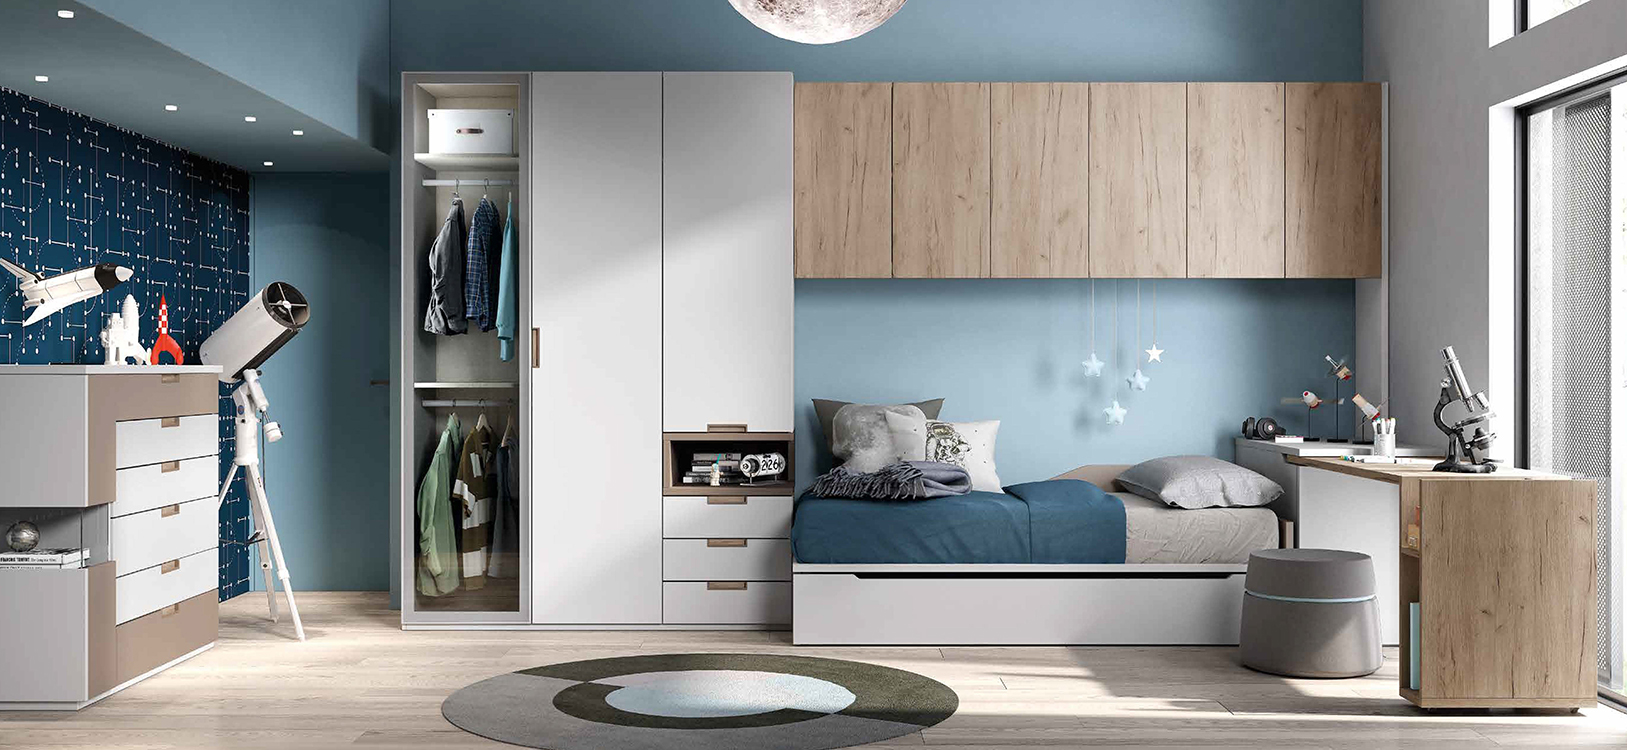 http://www.munozmuebles.net/nueva/catalogo/juveniles-modulares.html - Mueble  color claro